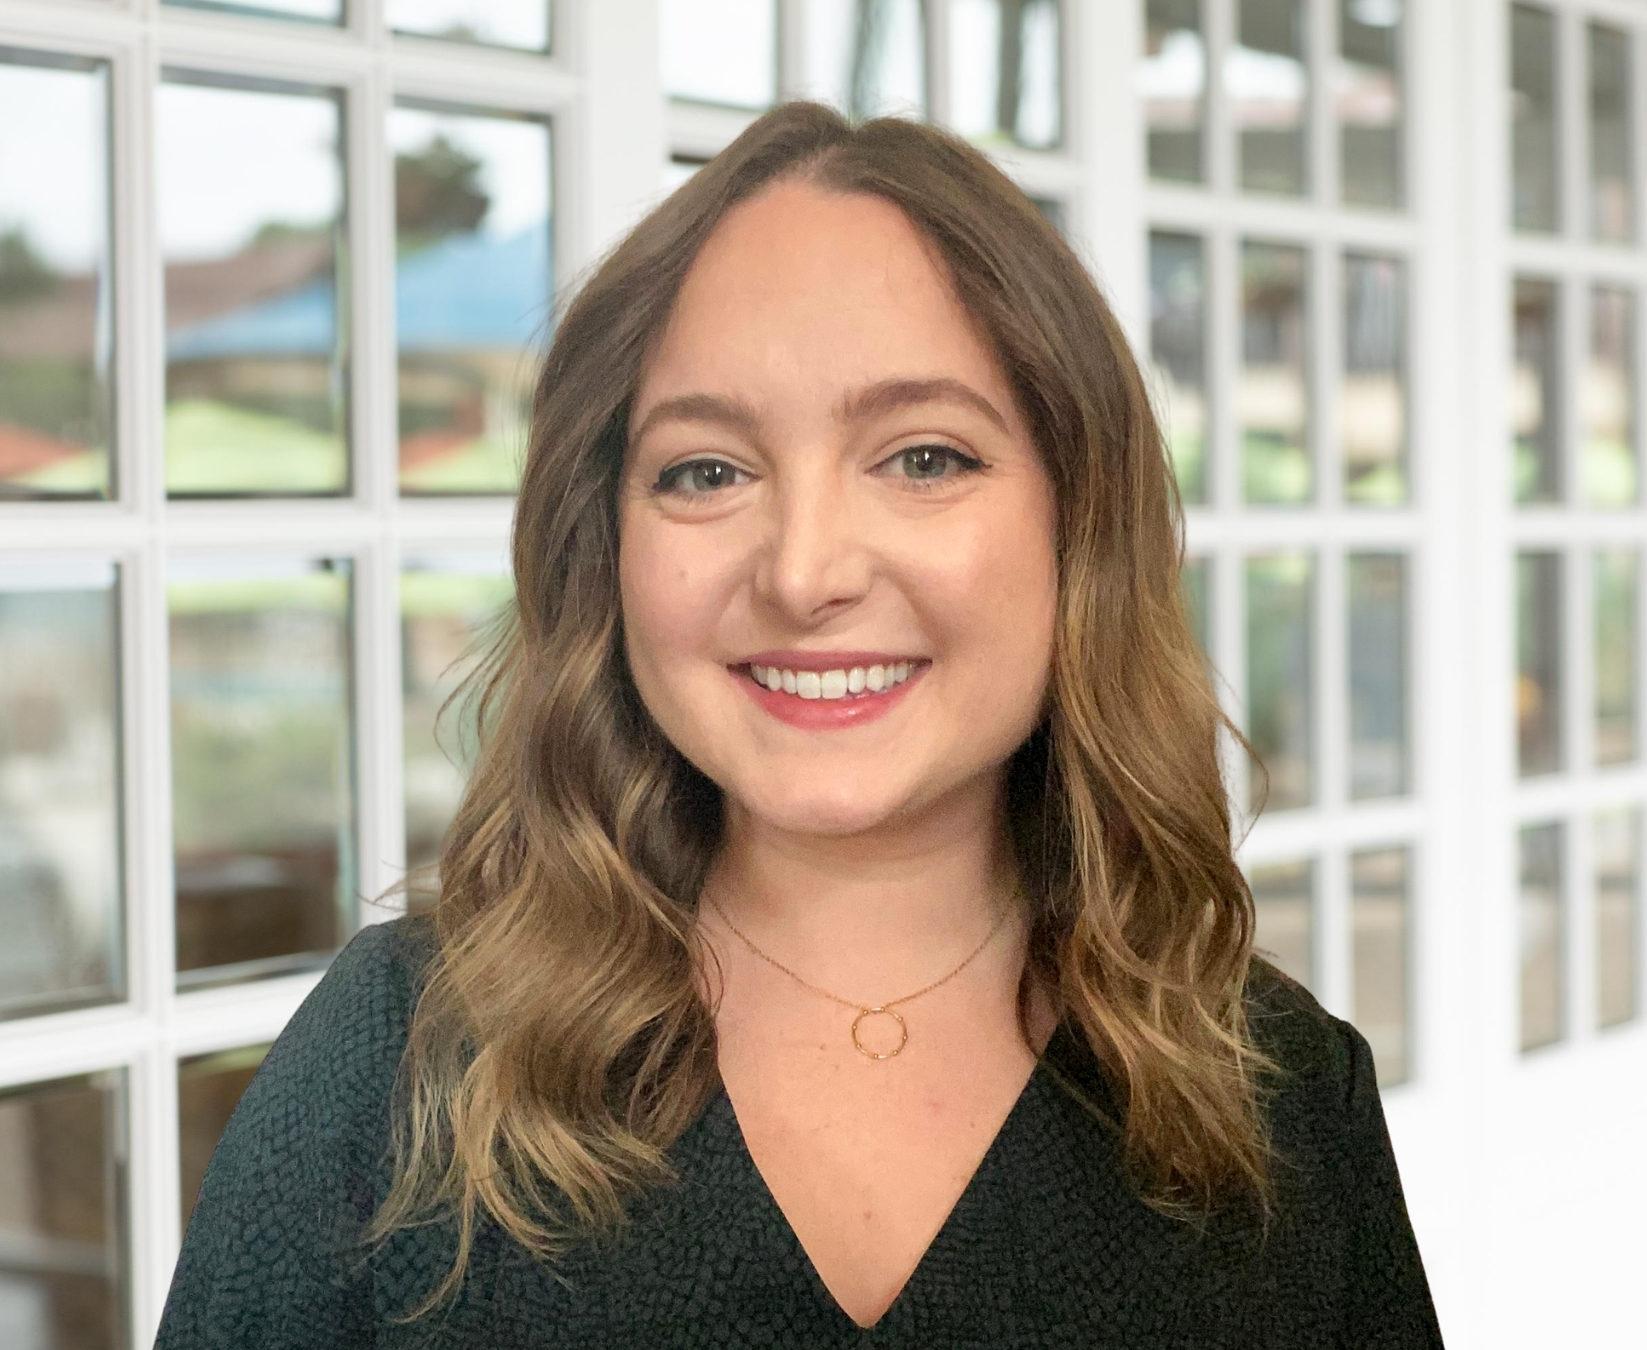 Courtnee Schraer counselor in San Antonio